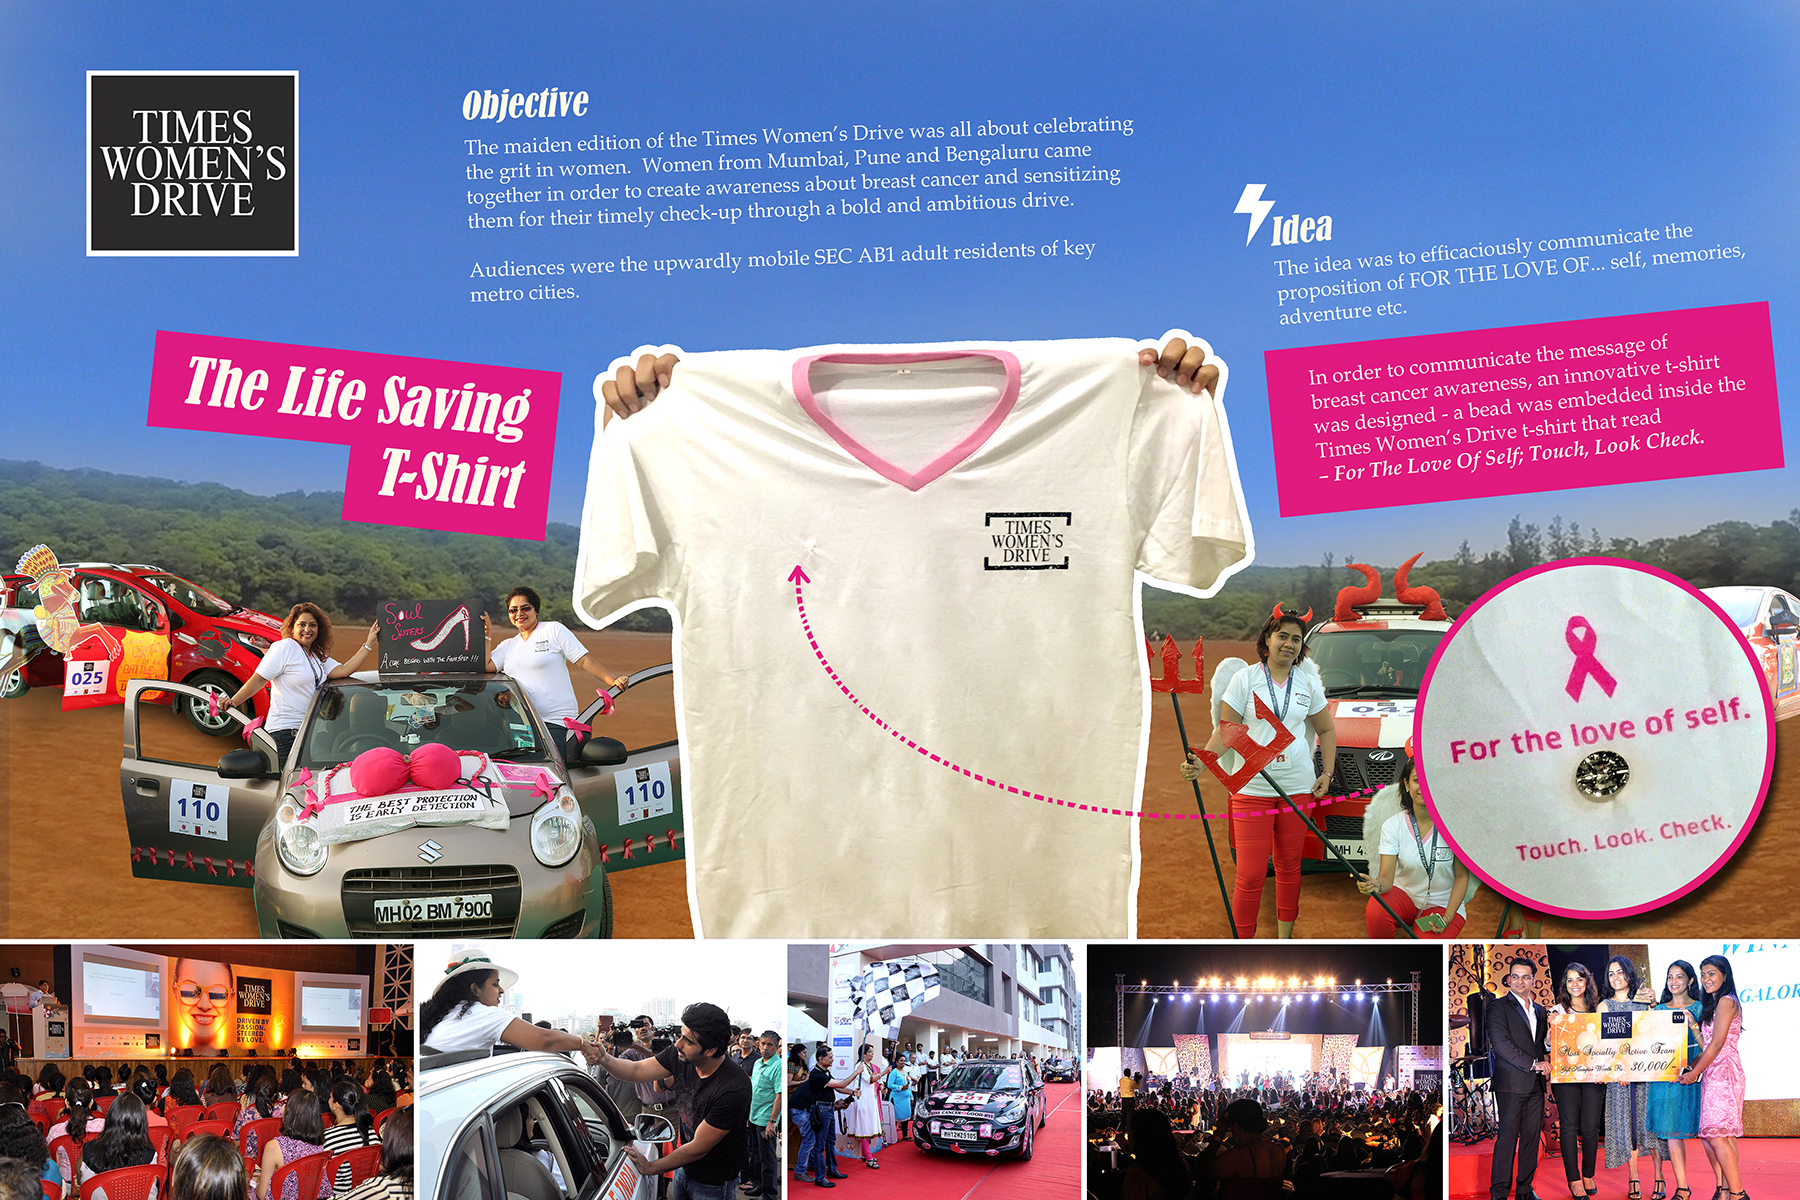 Times Women's Drive - The Life Saving T-Shirt